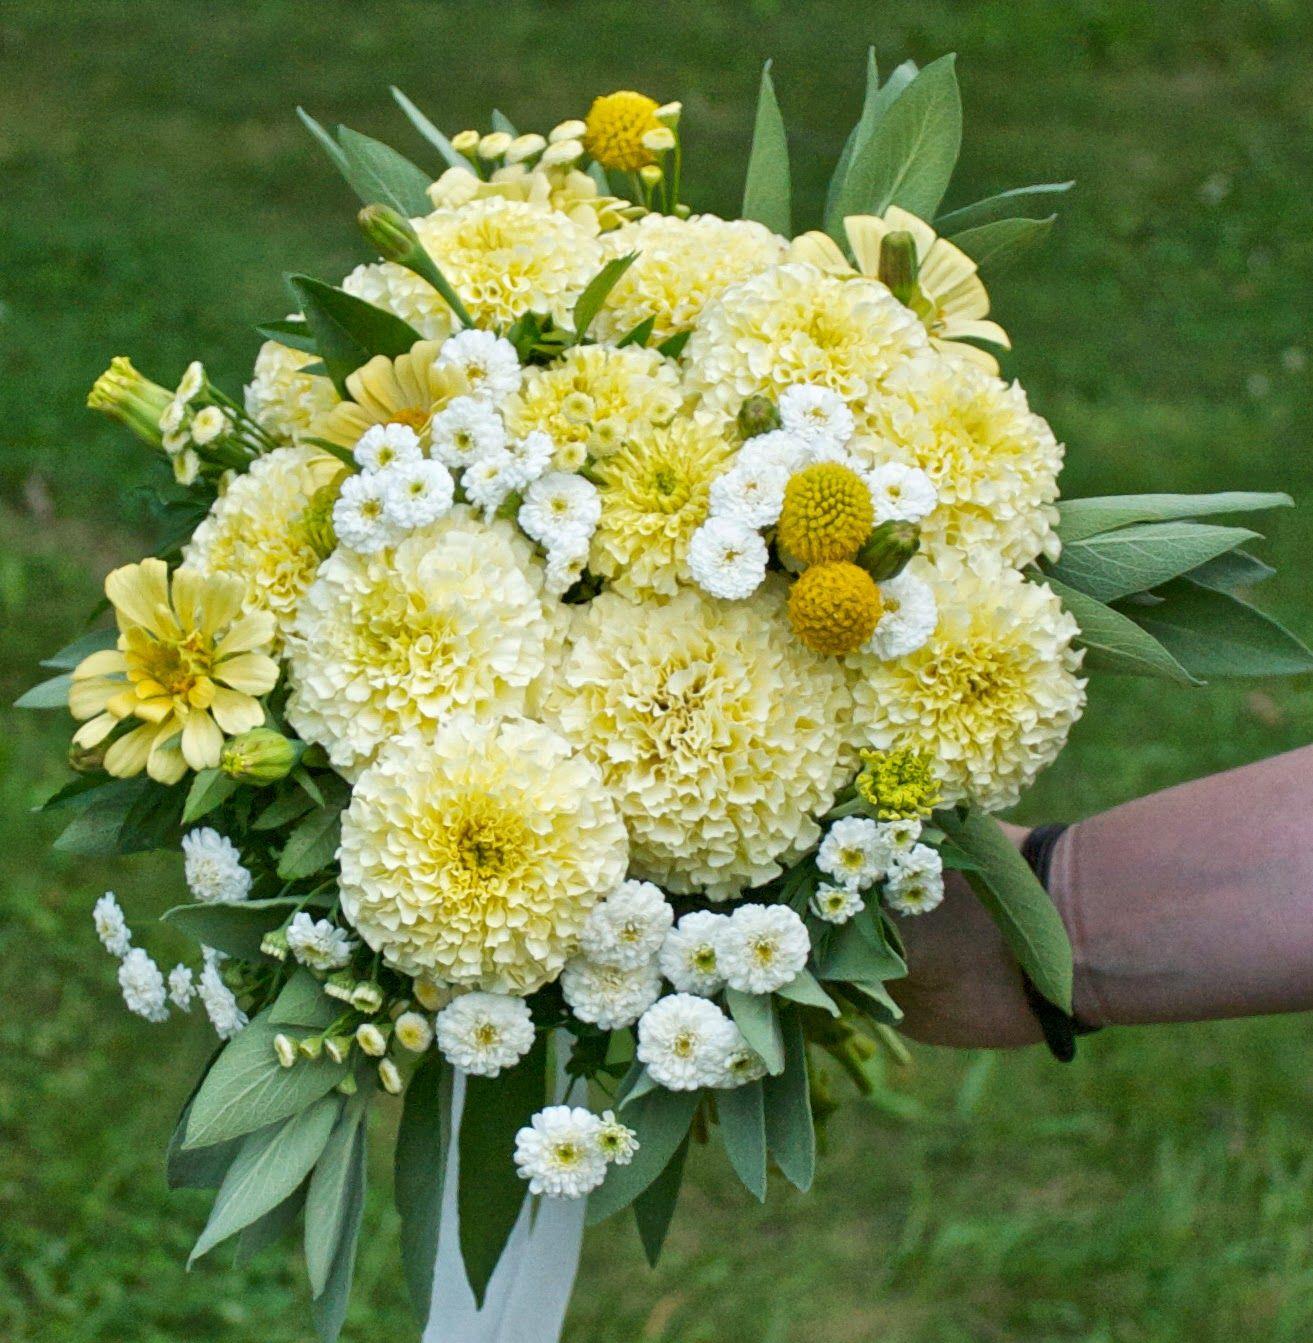 Marigold Vanilla Improved Hybrid Zinnia Creamy Yellow Giant